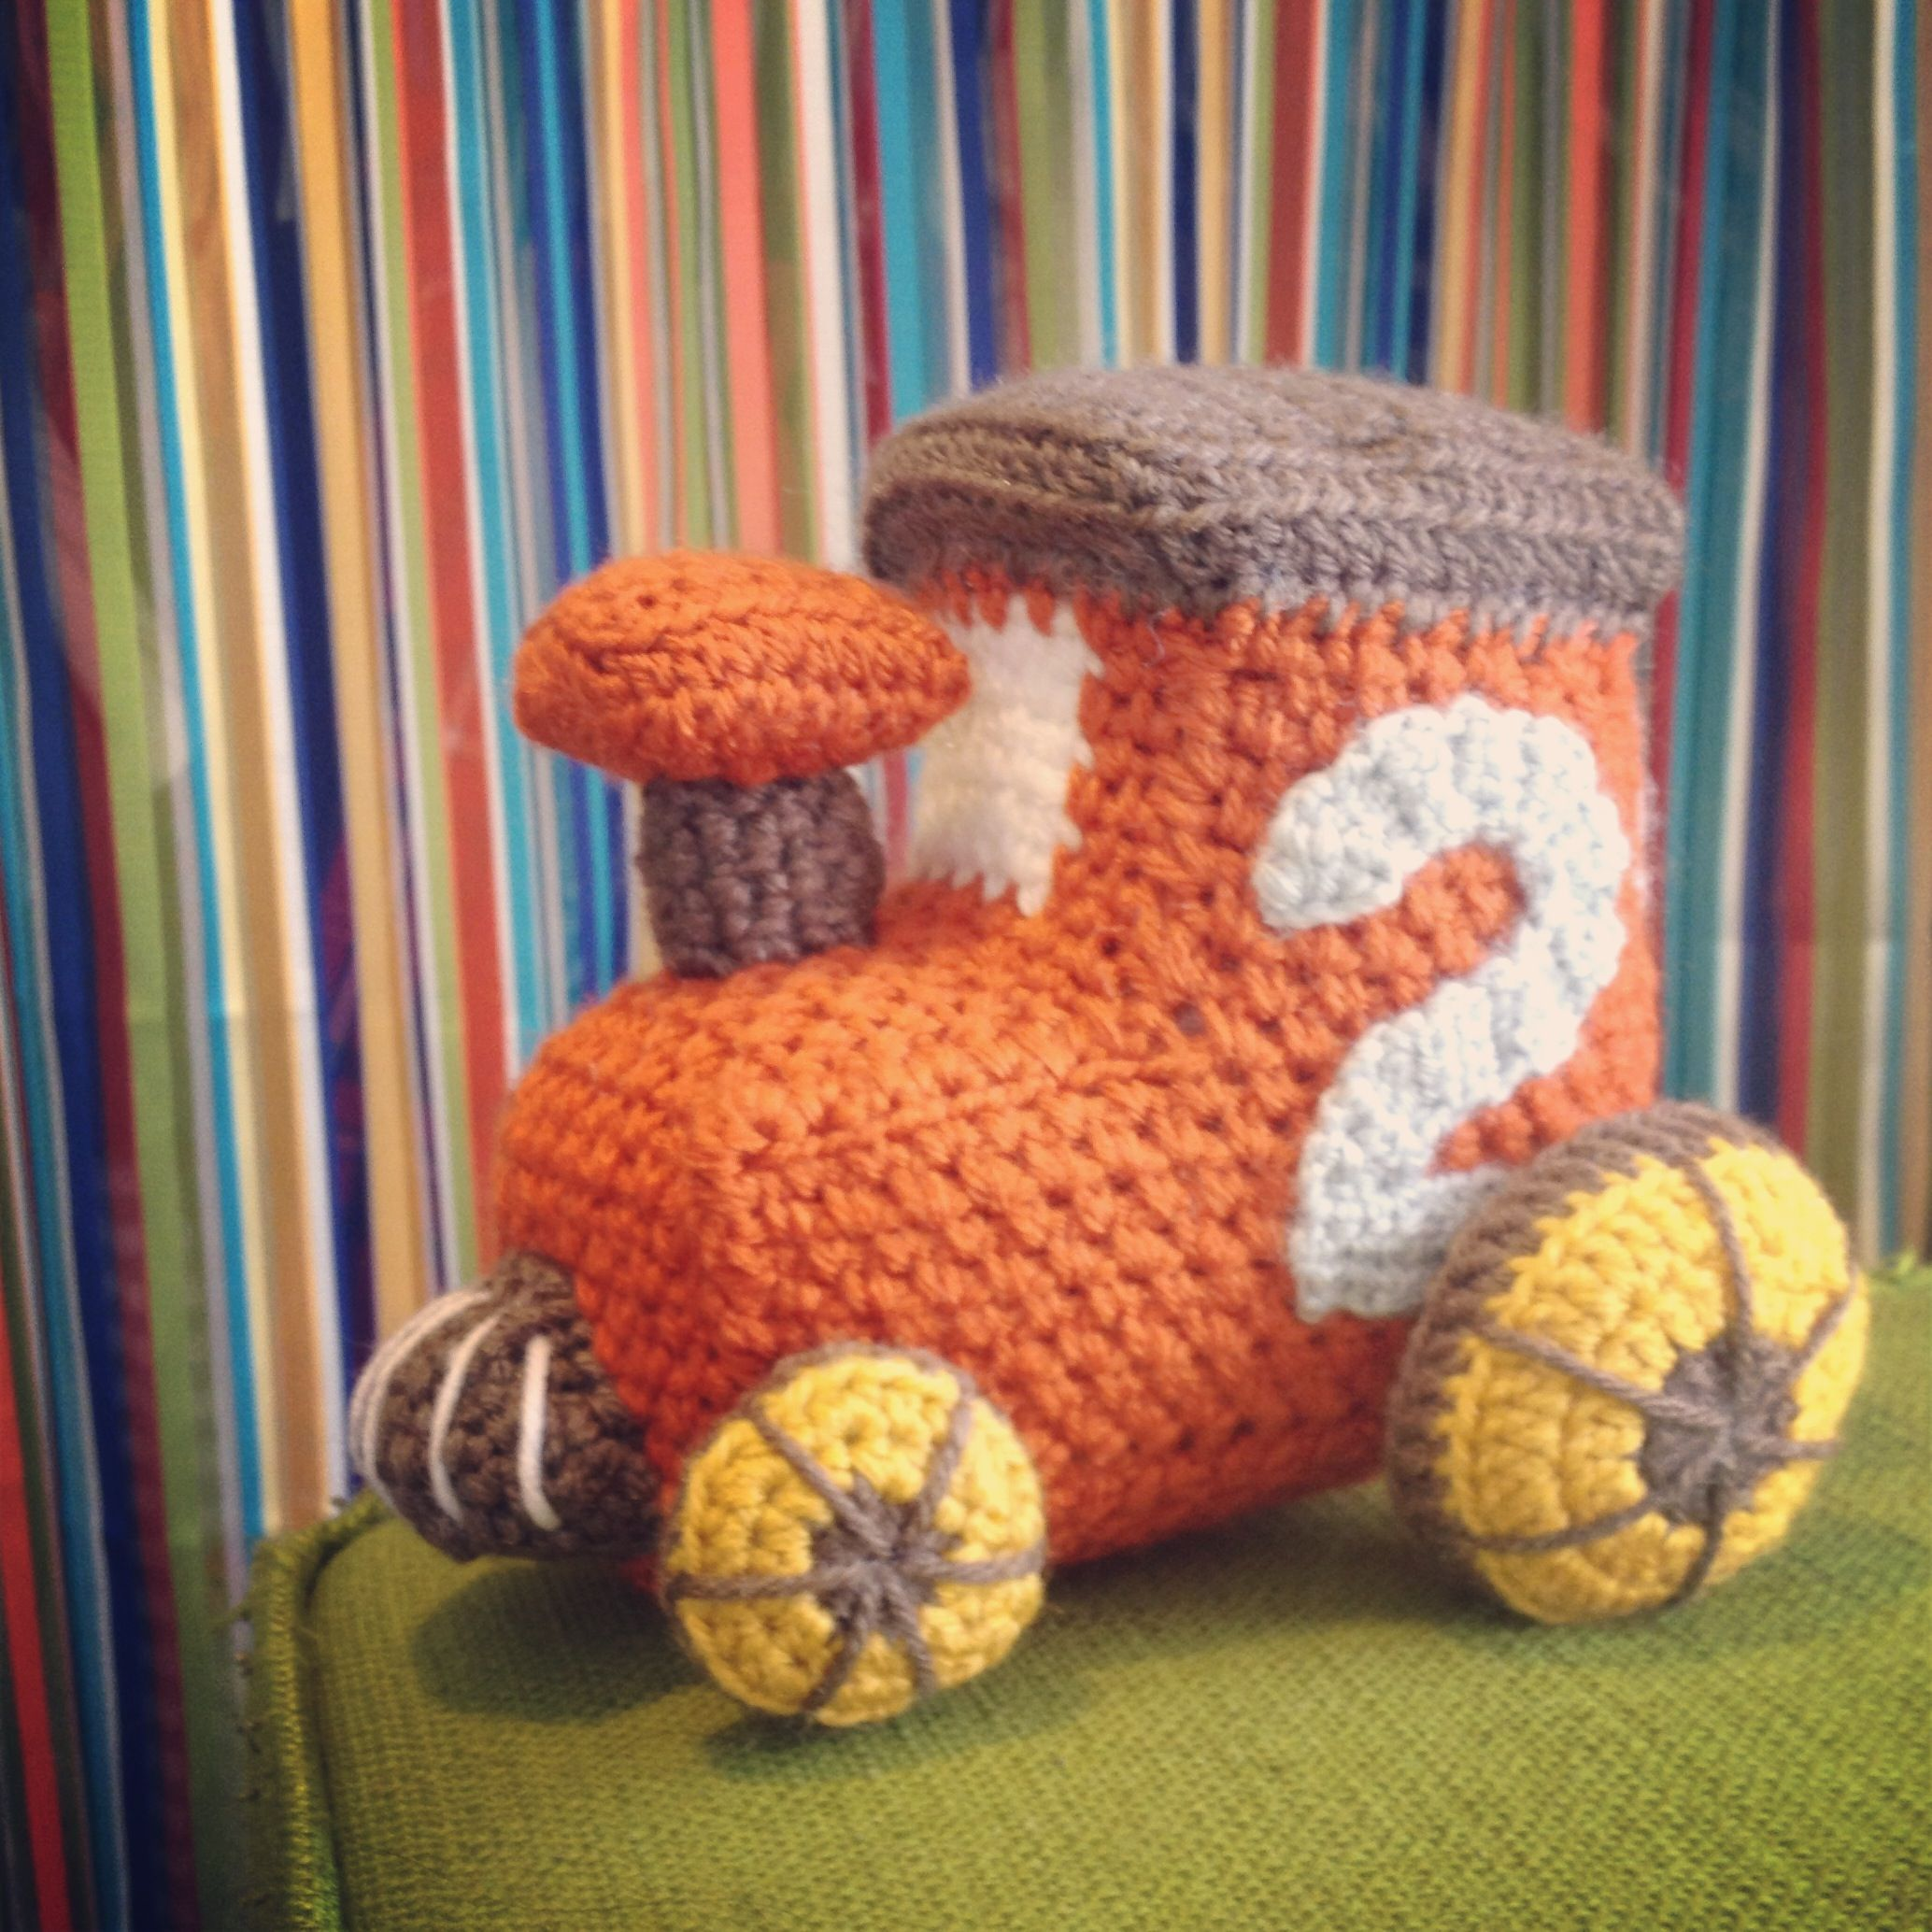 Little Toy Train Pattern | Crafts: Amigurumi | Pinterest | Medios de ...